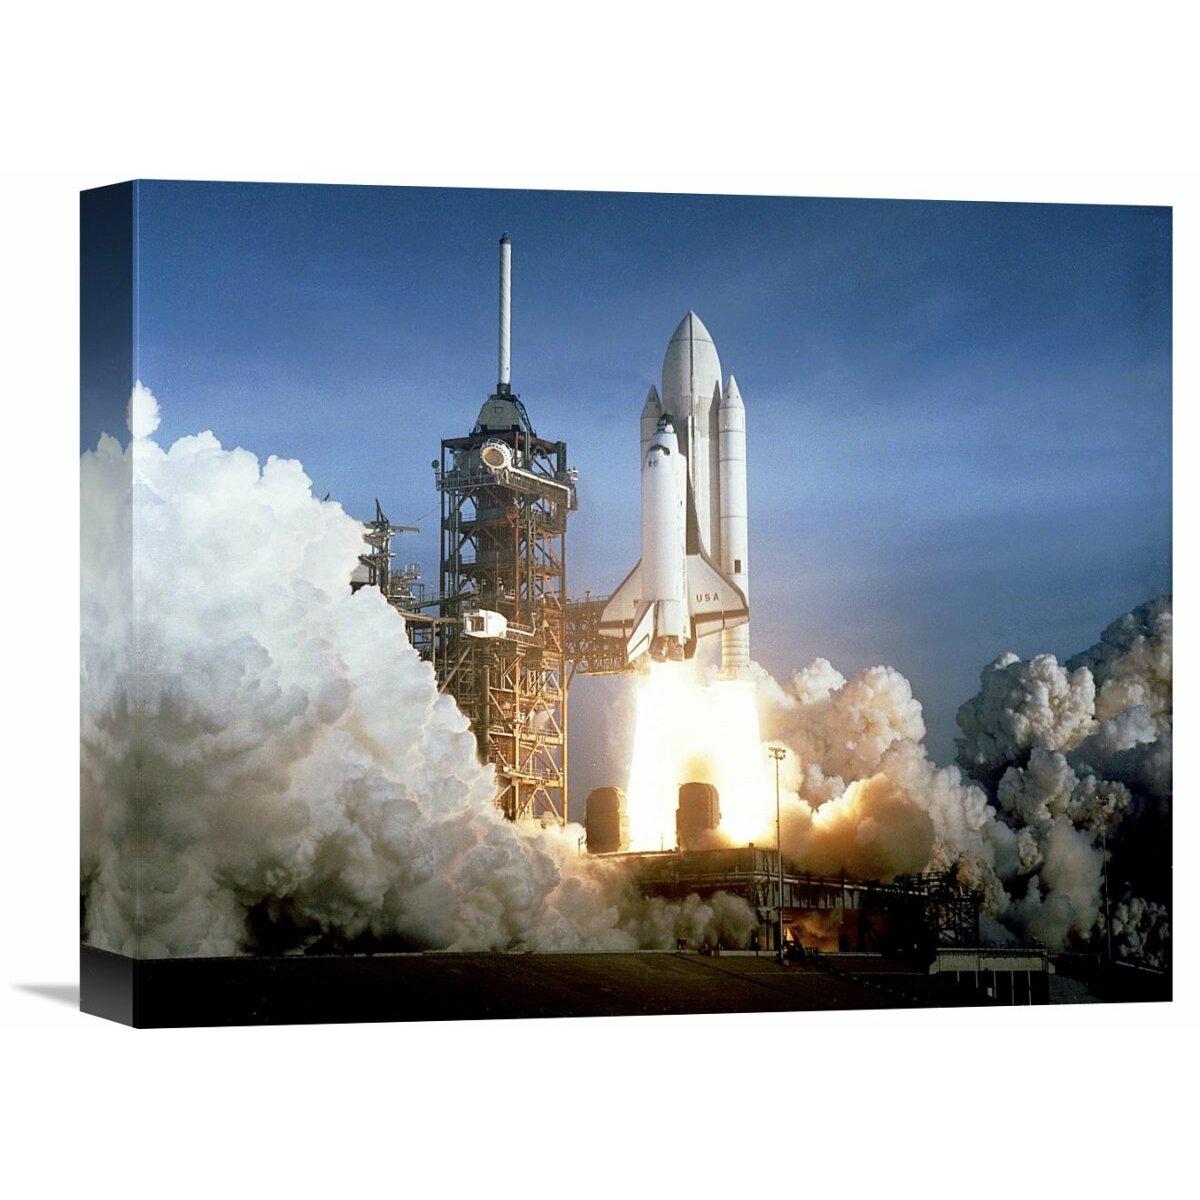 space shuttle columbia launch 1981 -#main